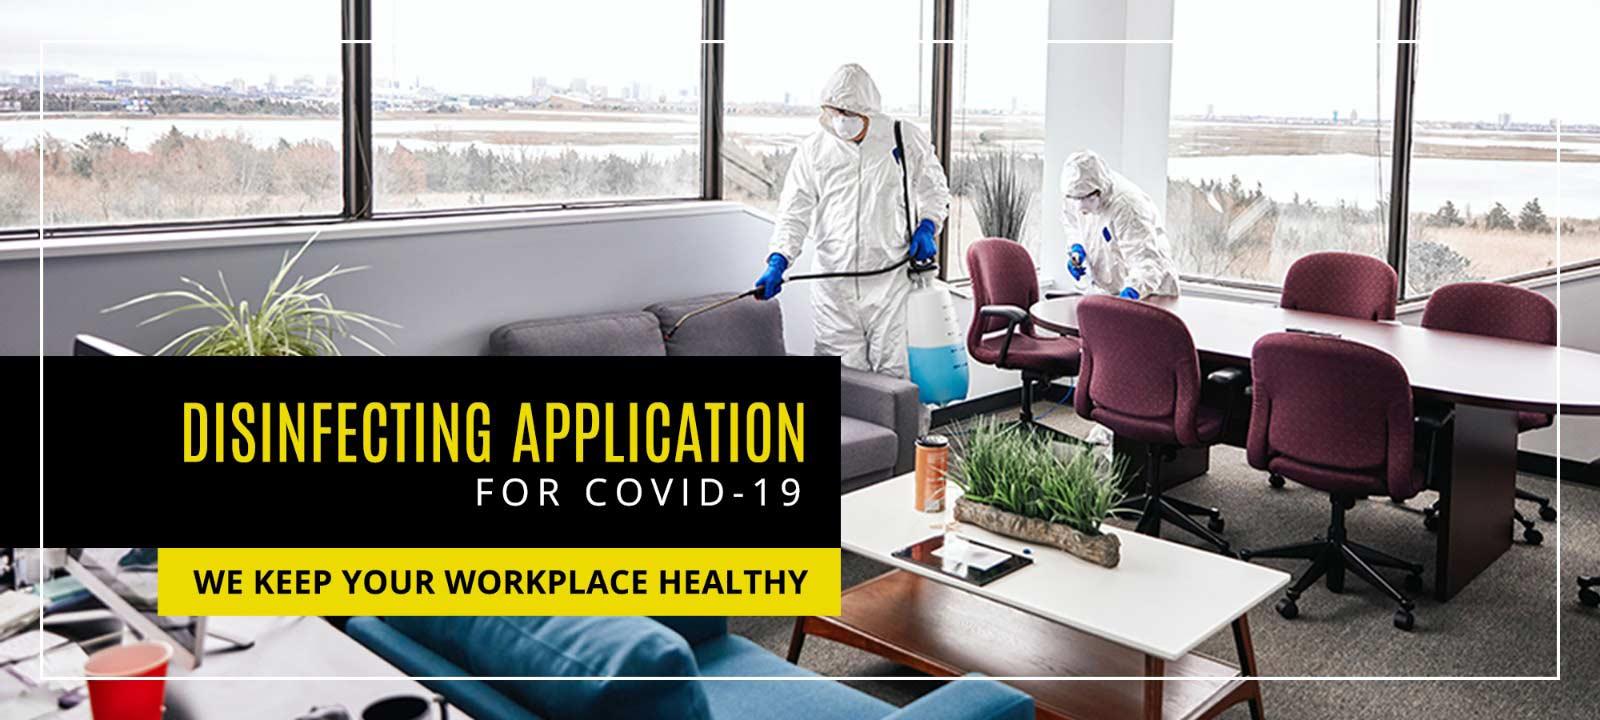 disinfecting-and-sanitizing-services-coronavirus-jani-king